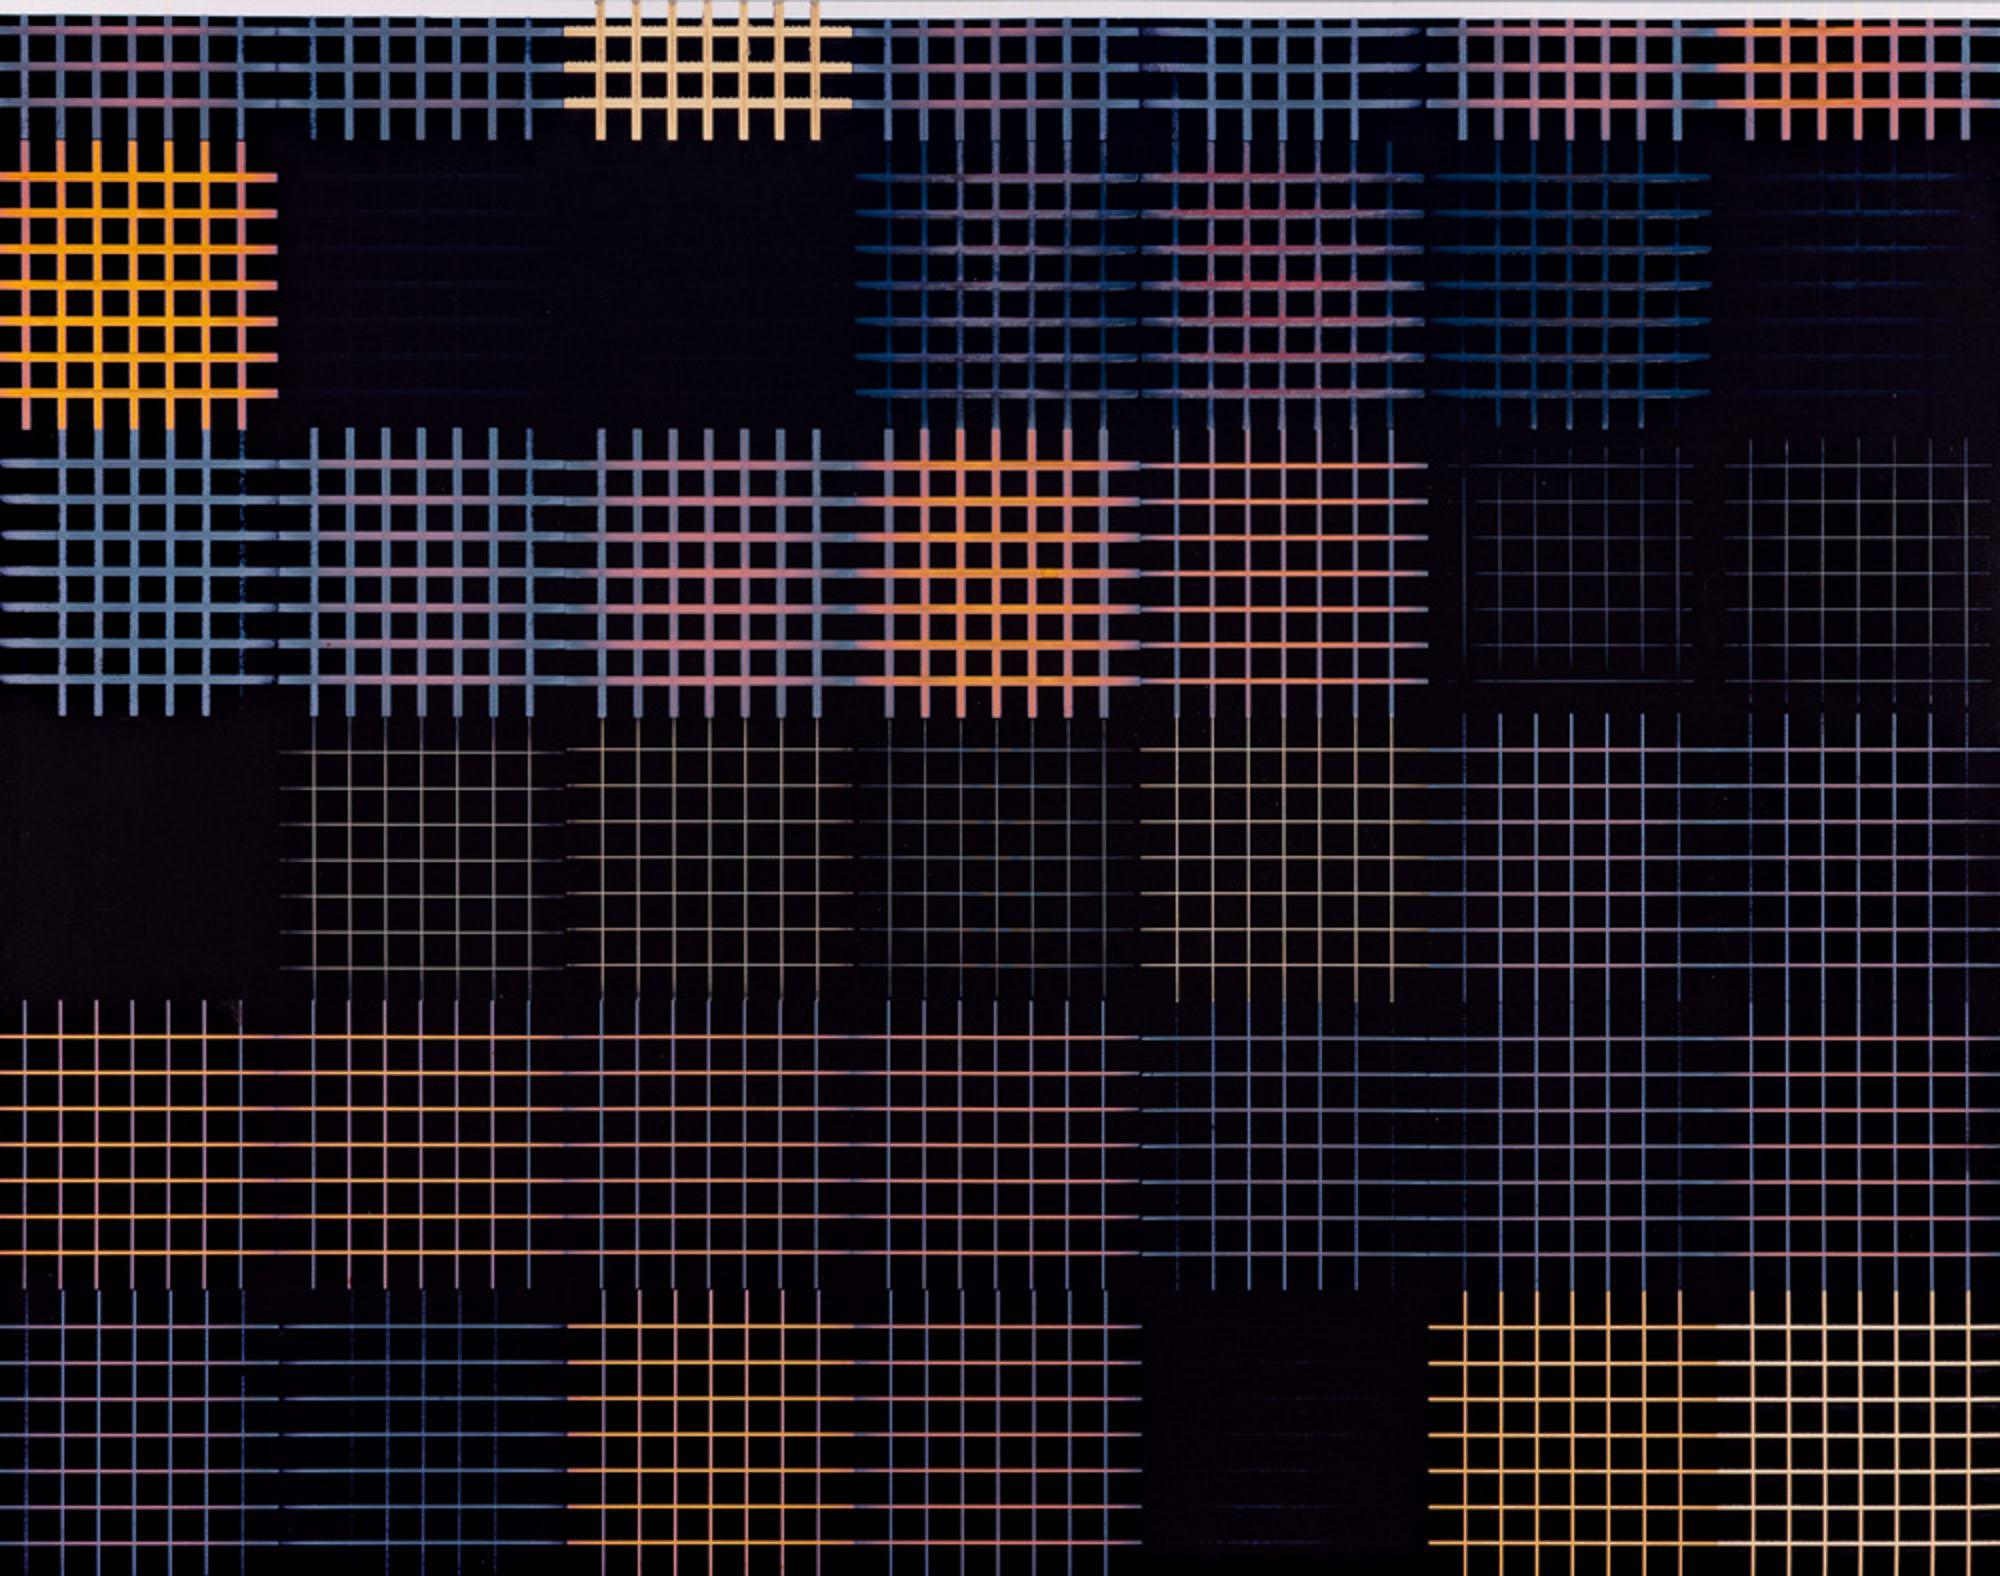 1.Untitled_JakeSneath_ChromogenicPaper_LaserEngraved_11x14_2017.jpeg